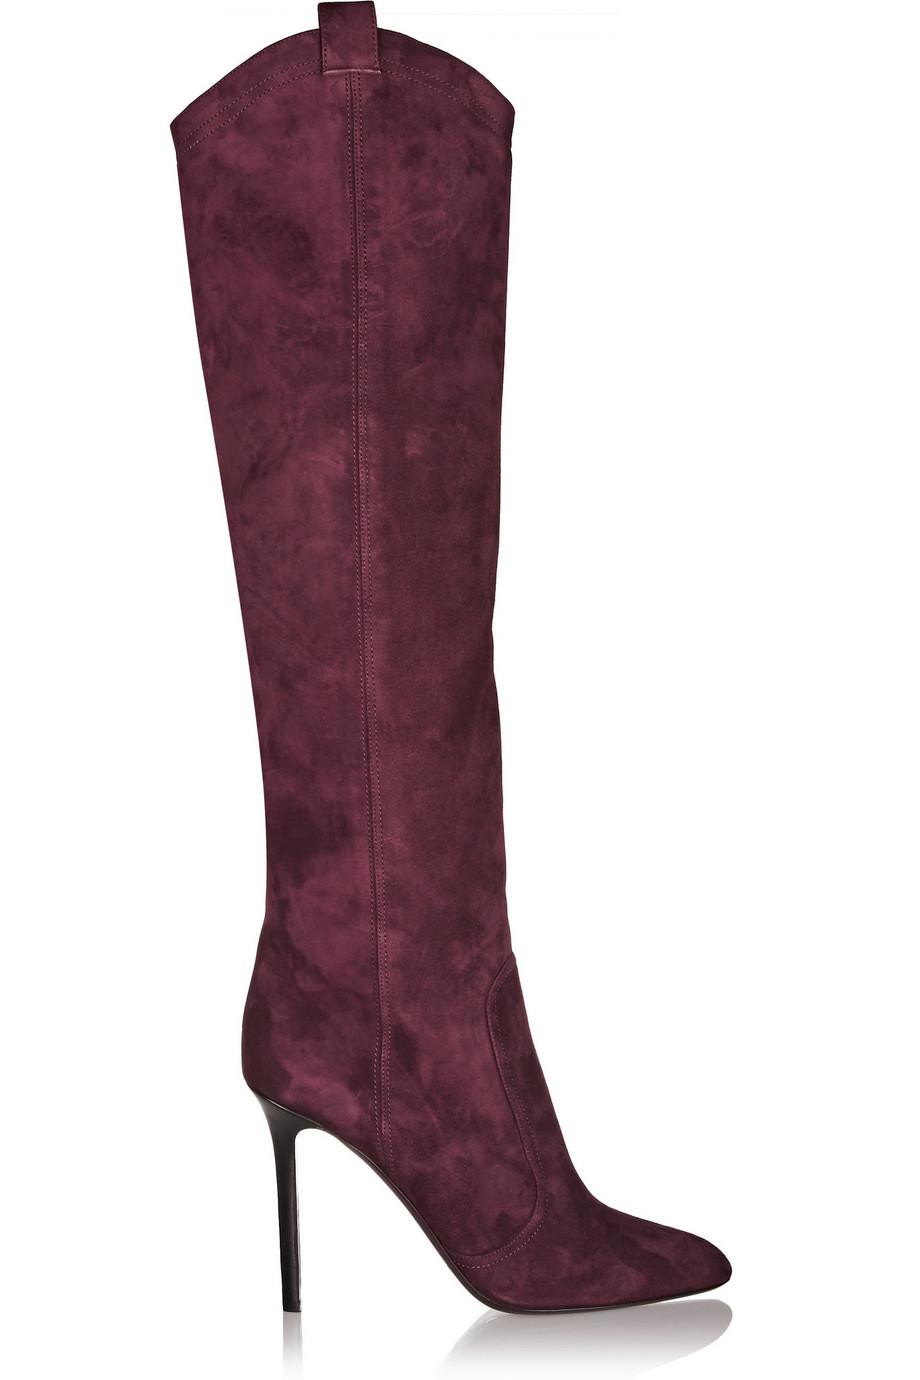 Tamara Mellon Crazy Ride Suede Knee Boots, Burgundy, Women's US Size: 10.5, Size: 41